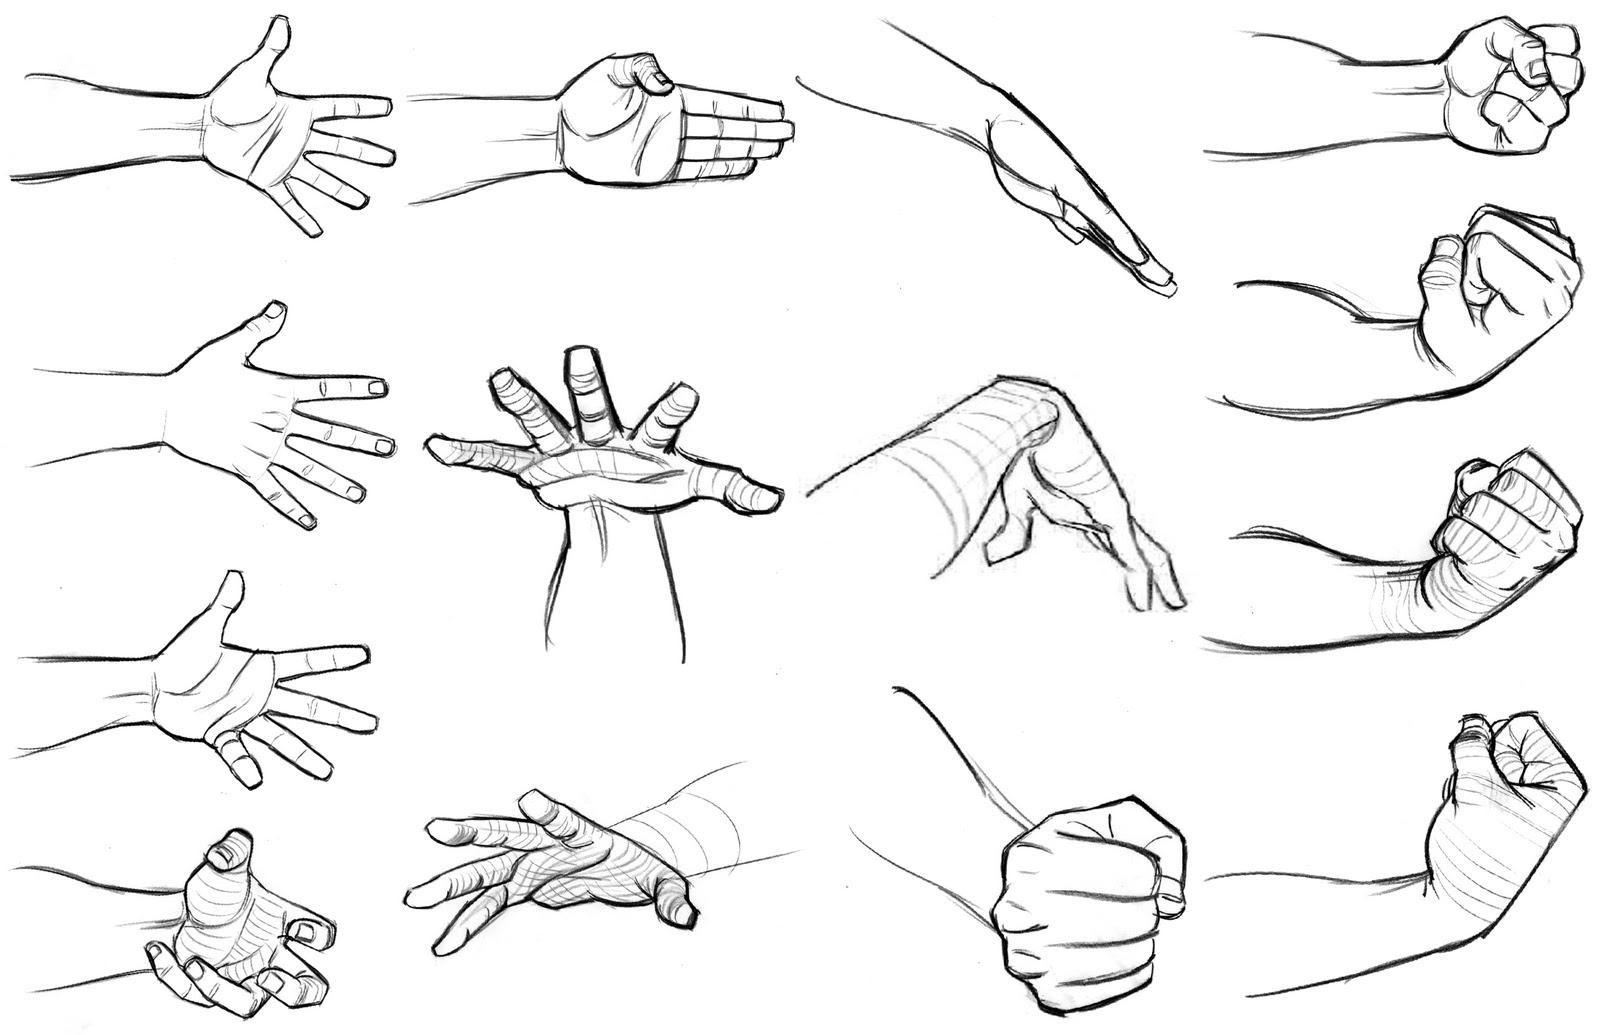 Like how to draw a cartoon fist one favourite